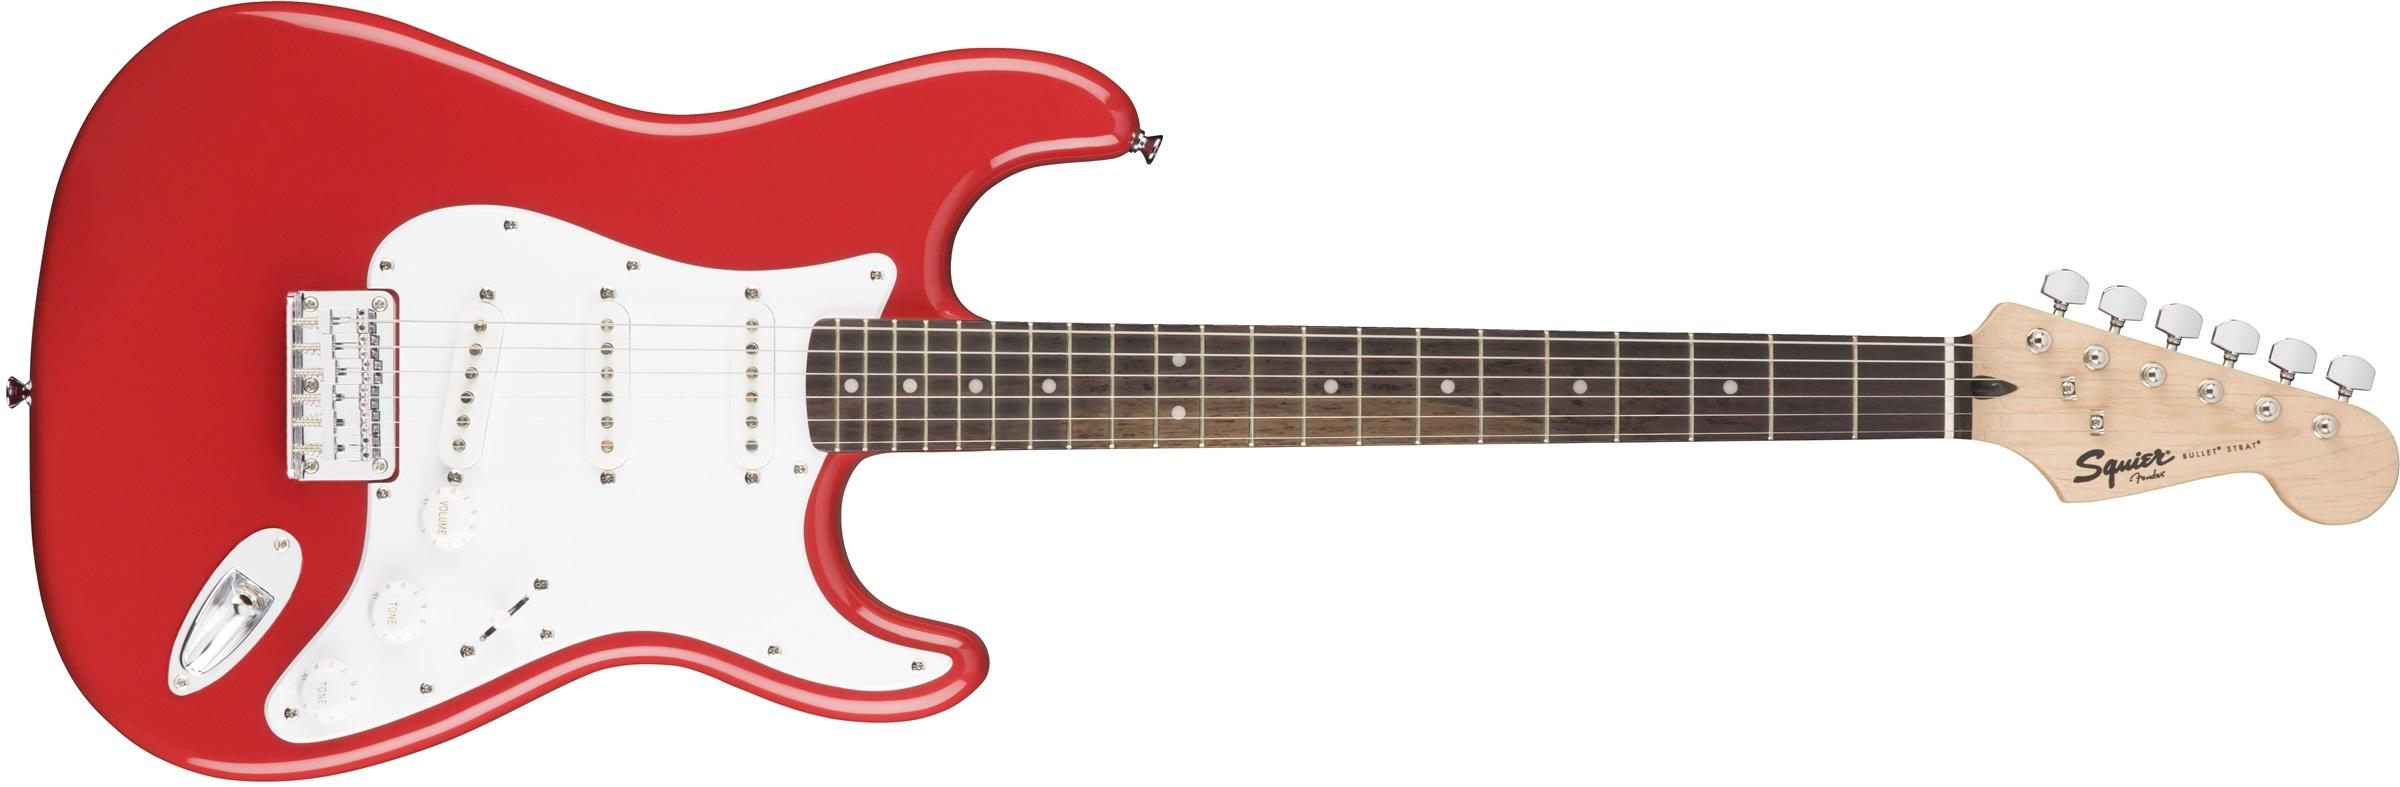 Fender Squier Bullet Strat HT HSS FRD